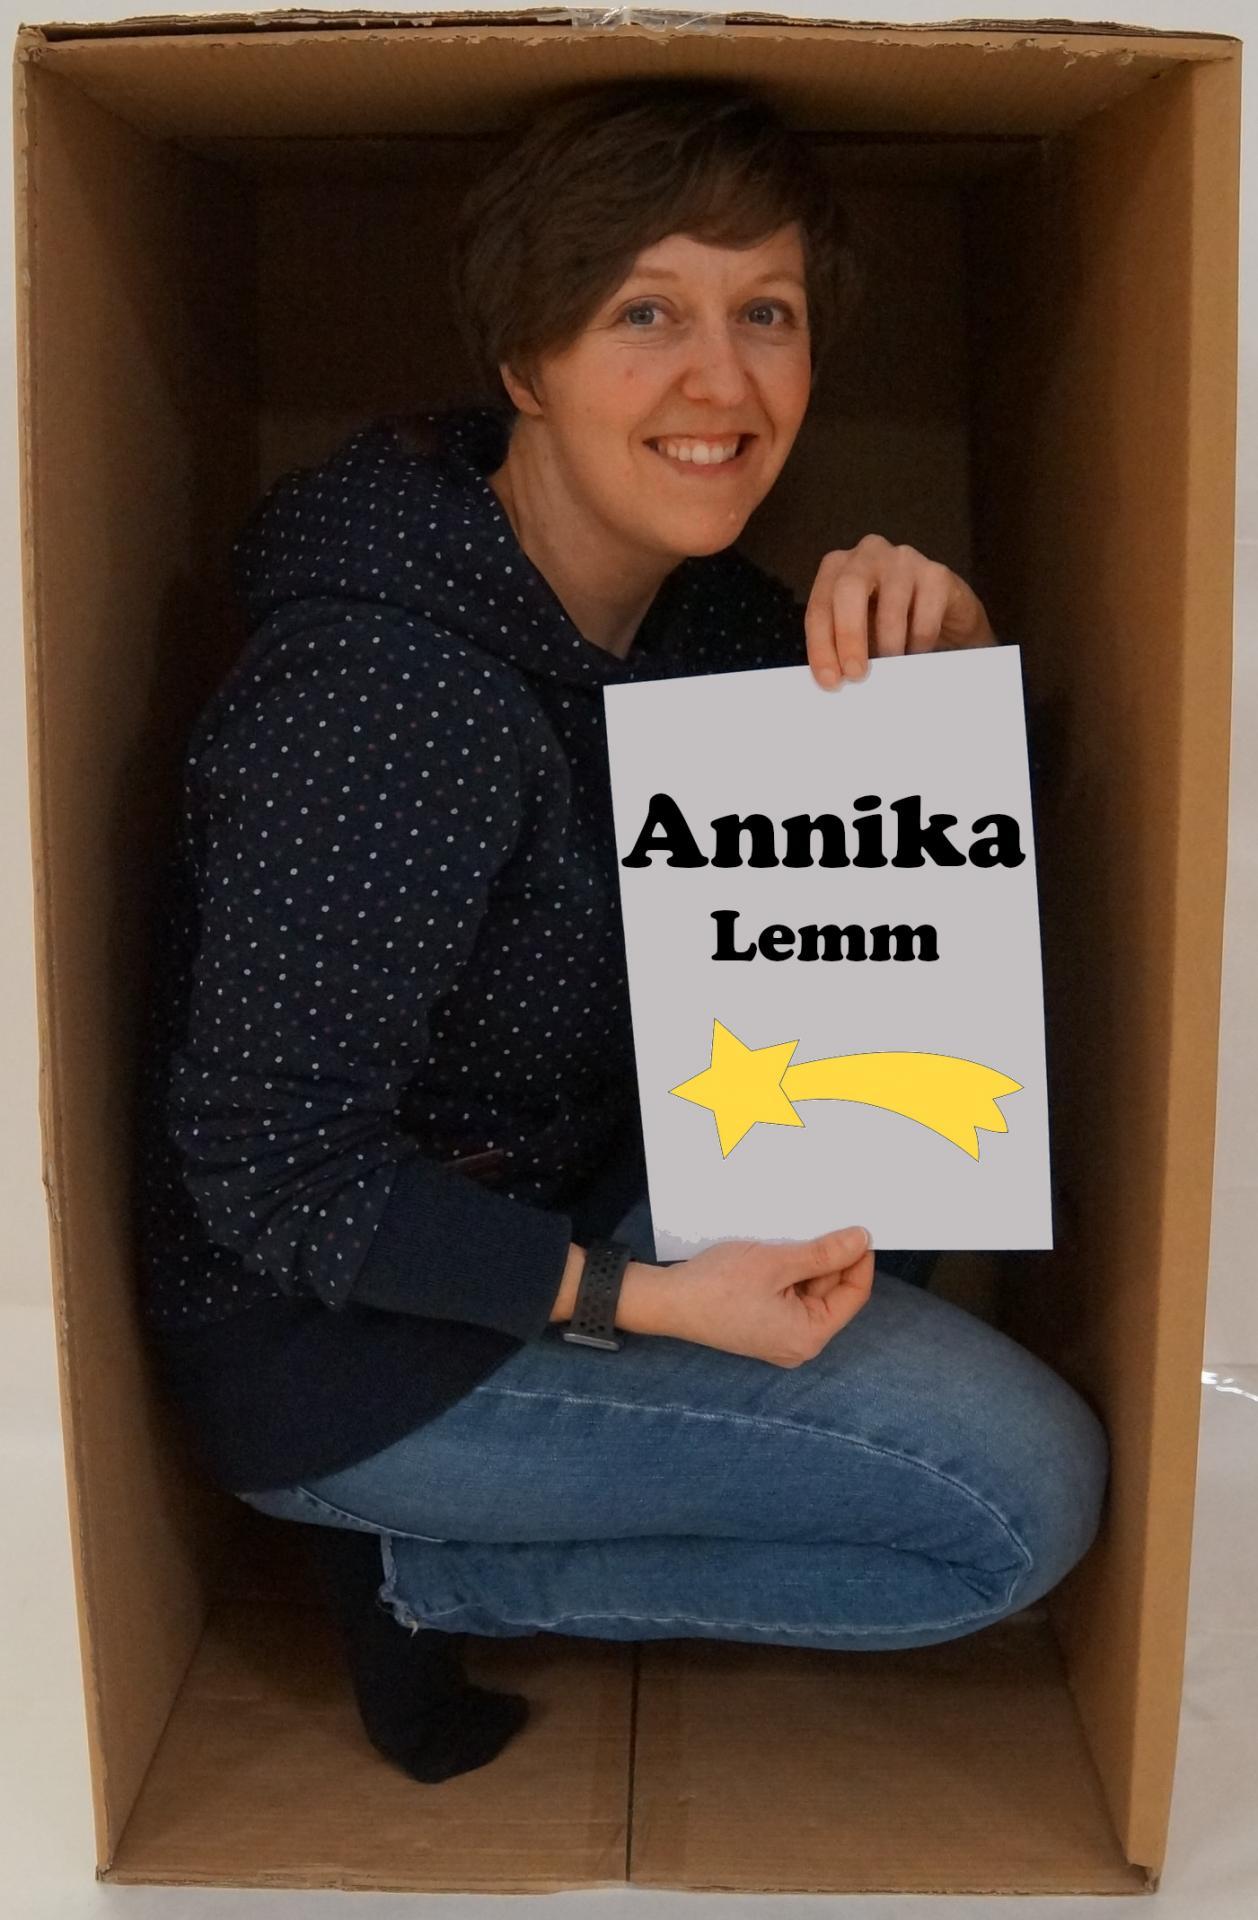 Annika Lemm